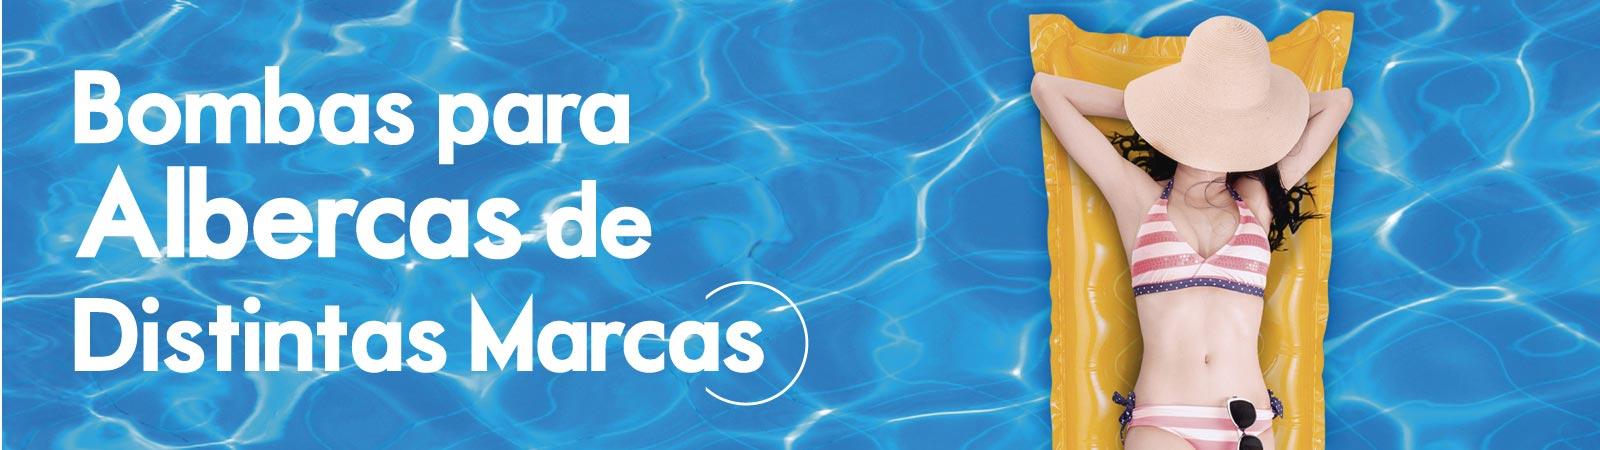 Motobombas para Albercas de varias marcas